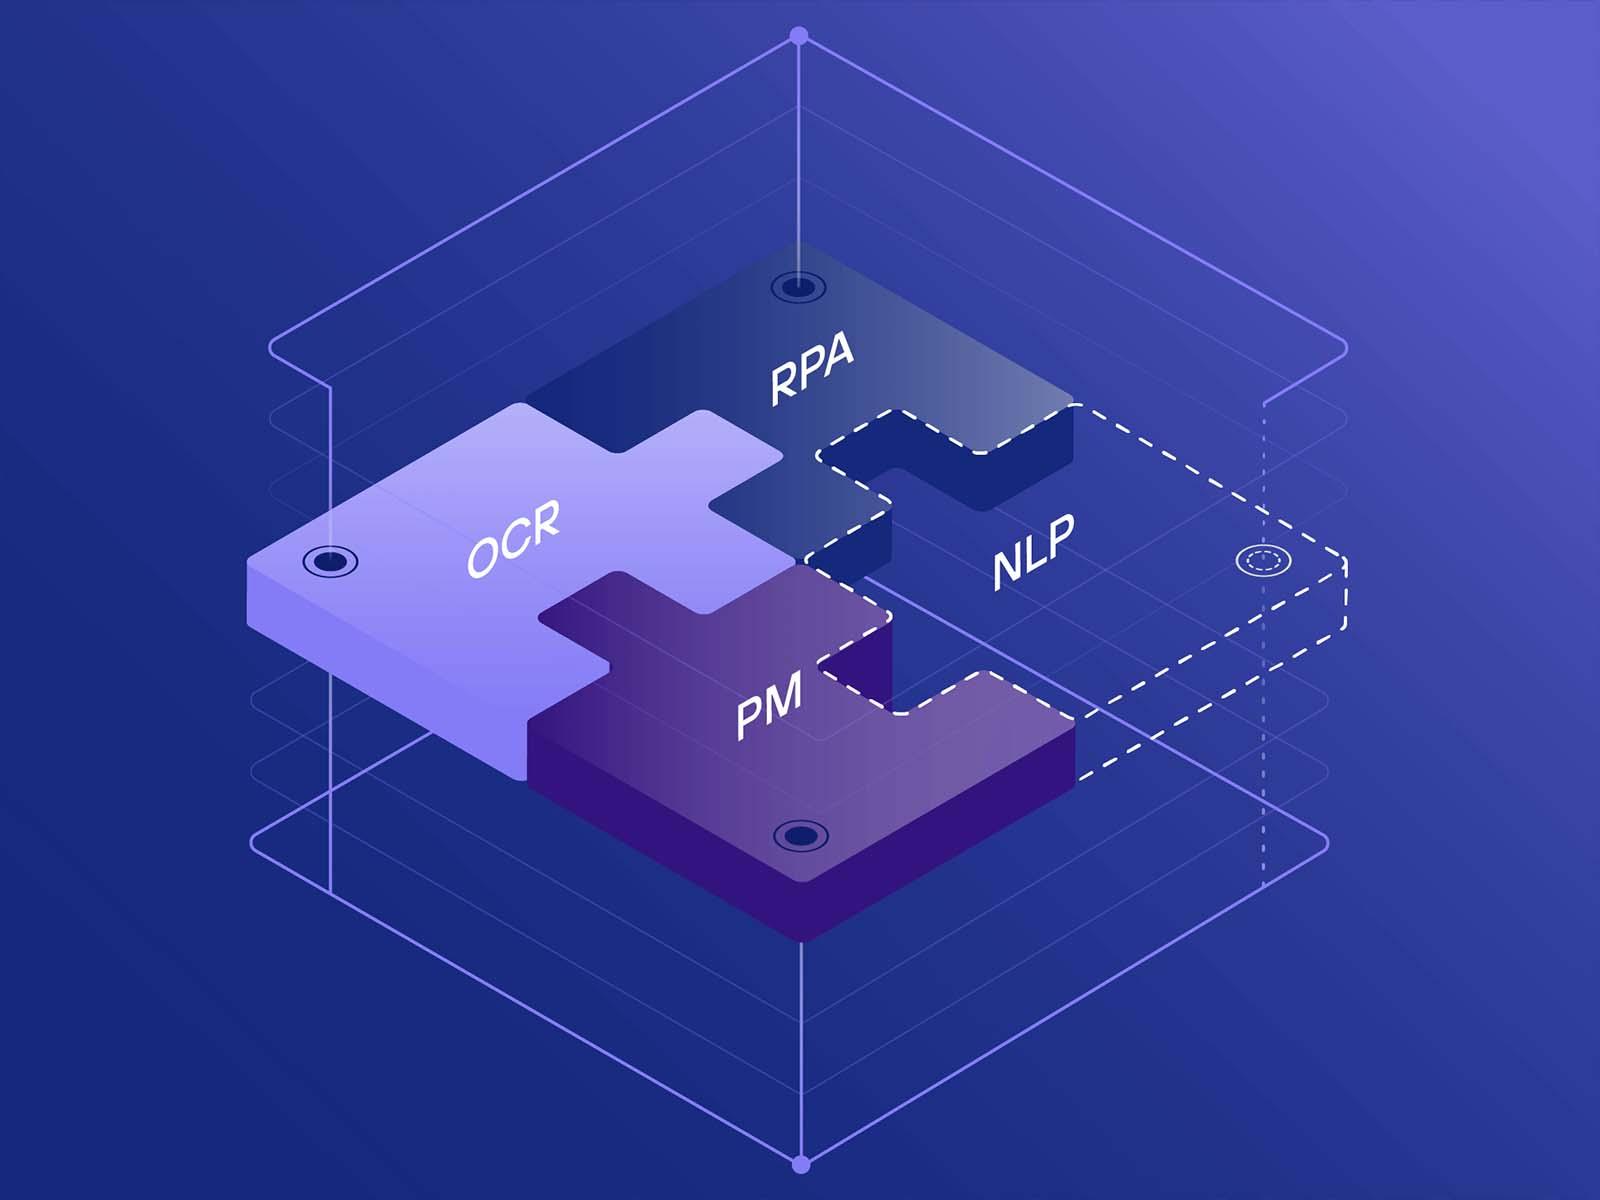 Conversational Data Intelligence and NLP